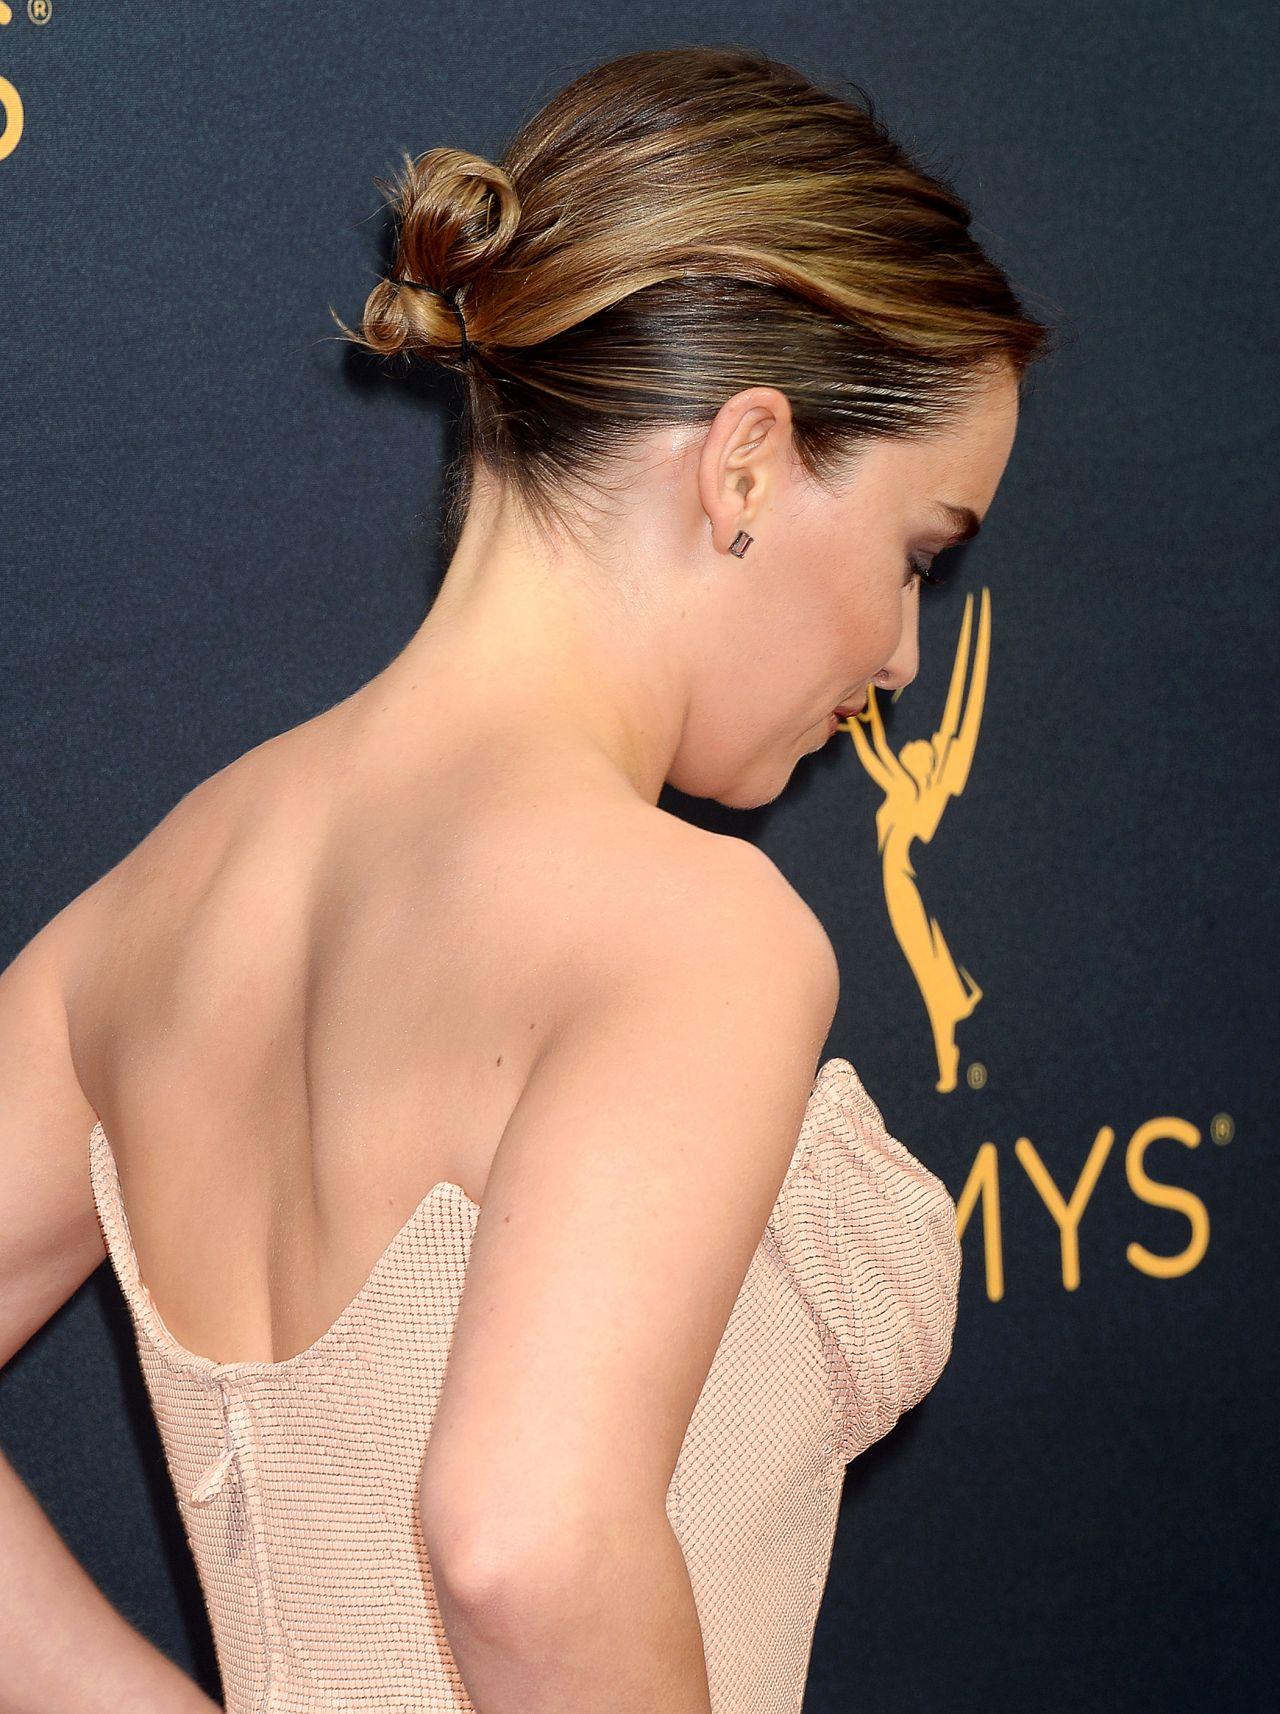 10 best photoshoots of Emilia Clarke aka Daenerys from